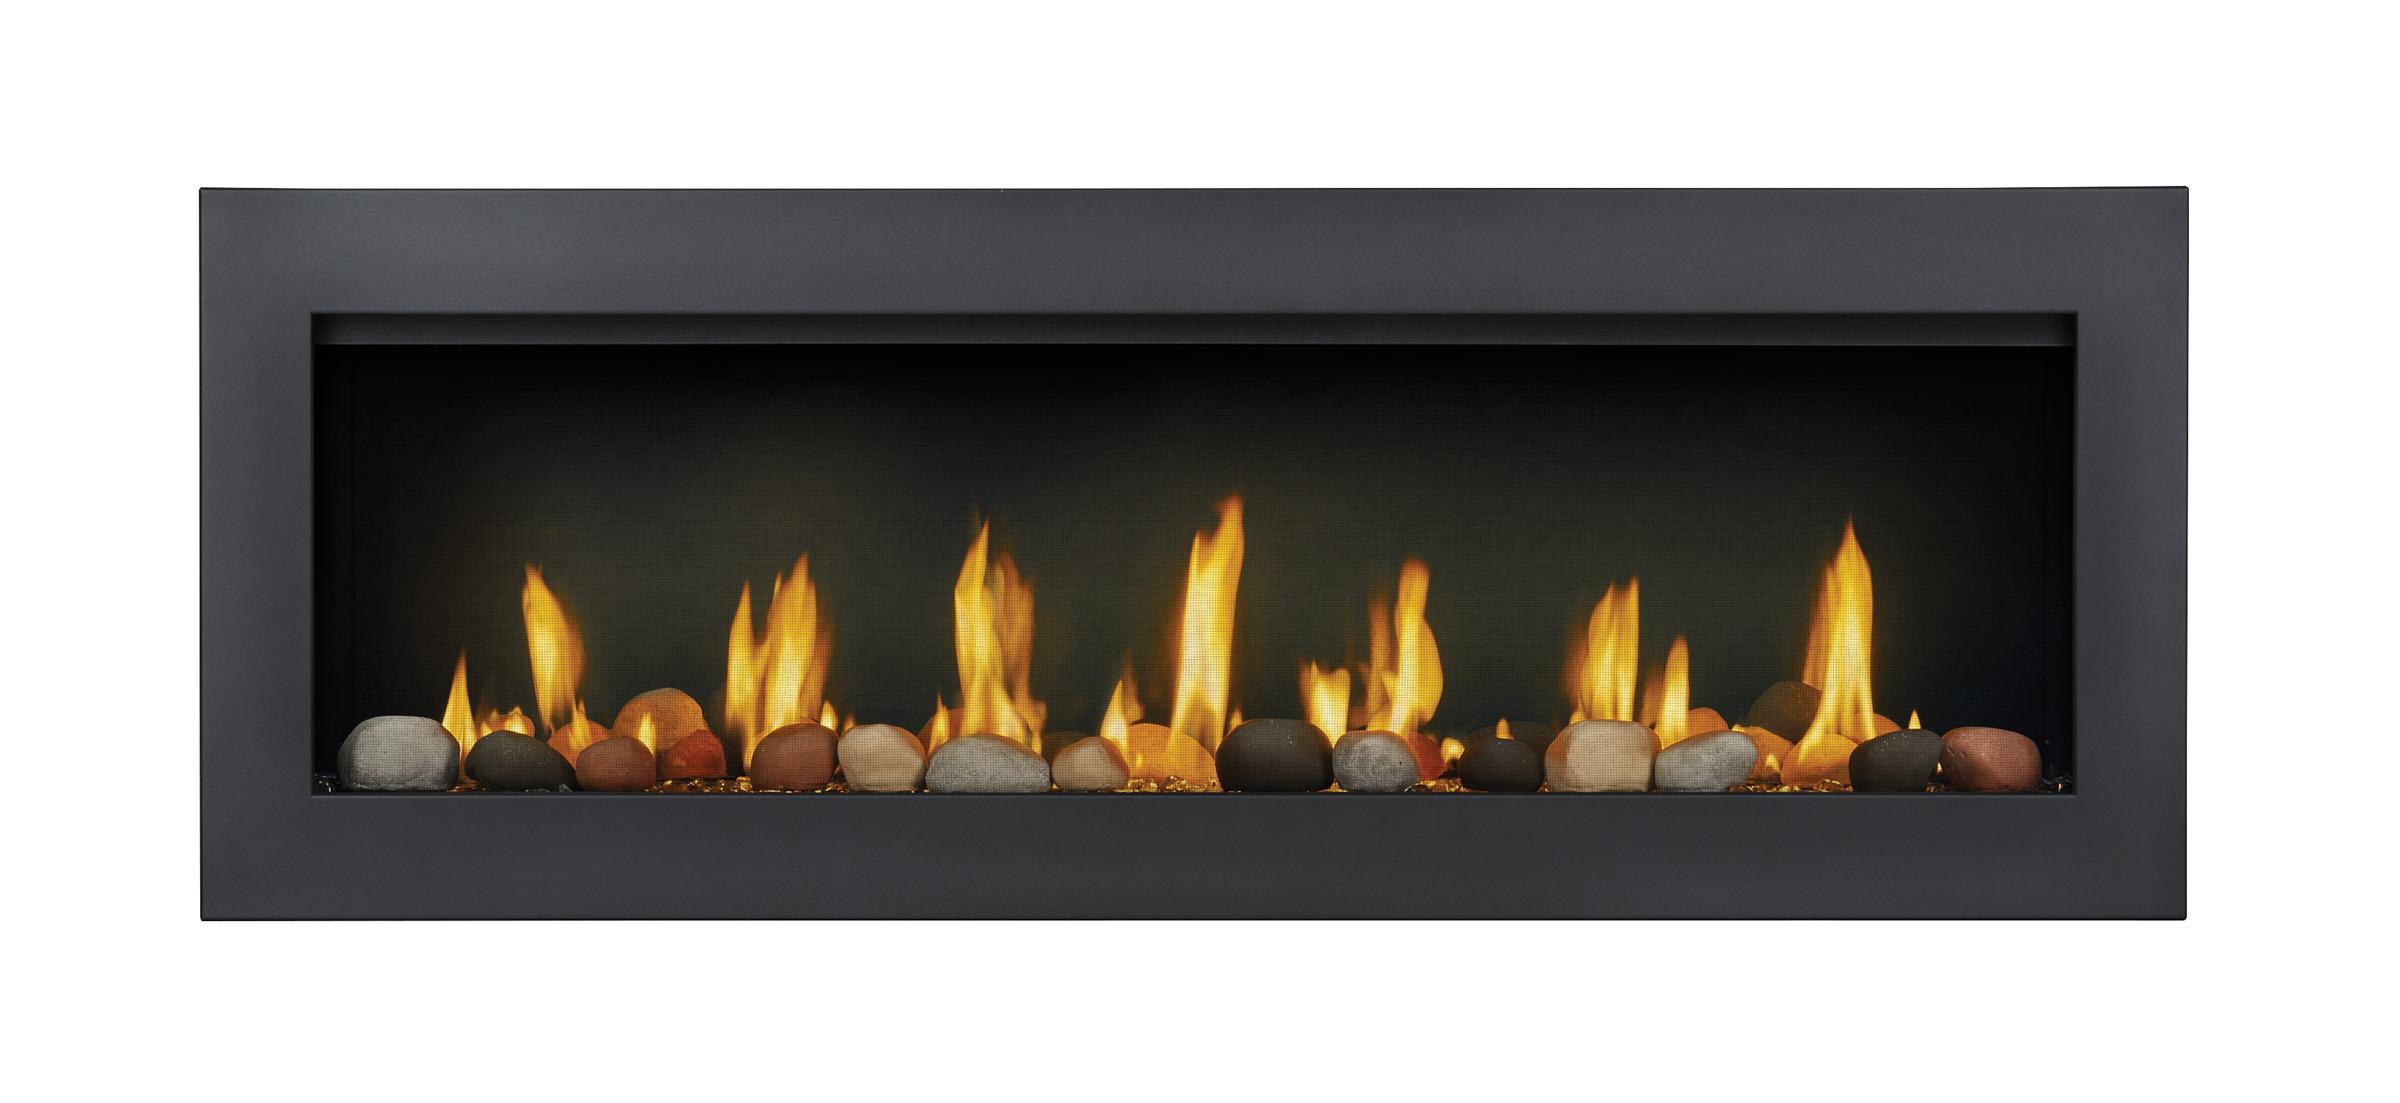 3 4 Quot Cobalt Blue Fire Glass Fireglass Fire Pit Fireplace Premium Fire Glass In Every Color